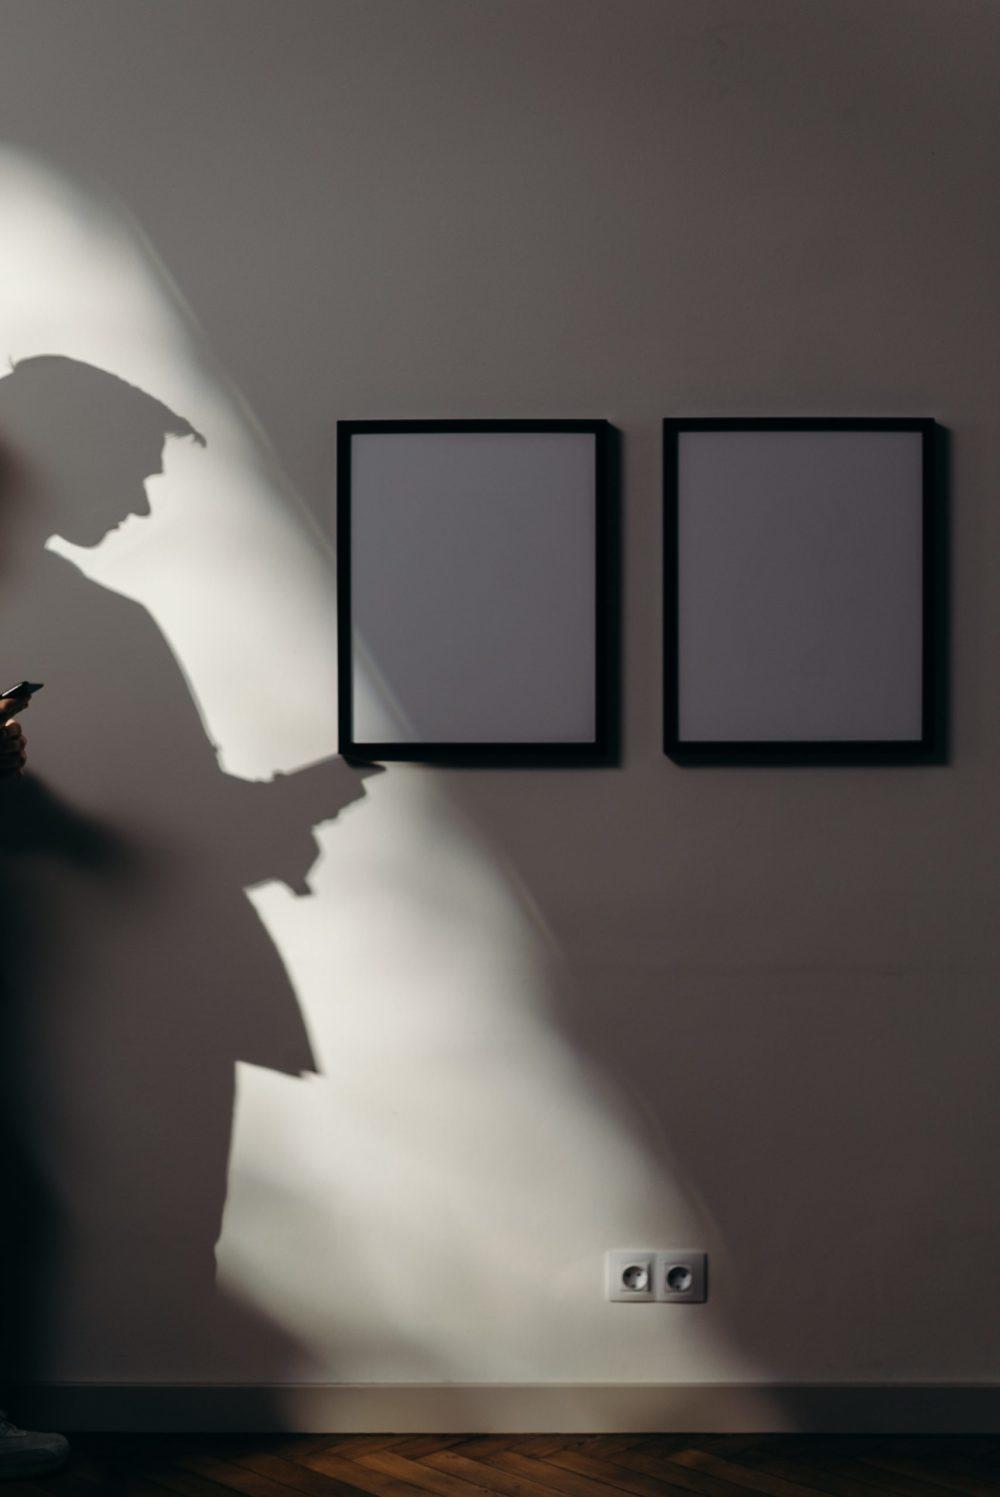 shadow making call